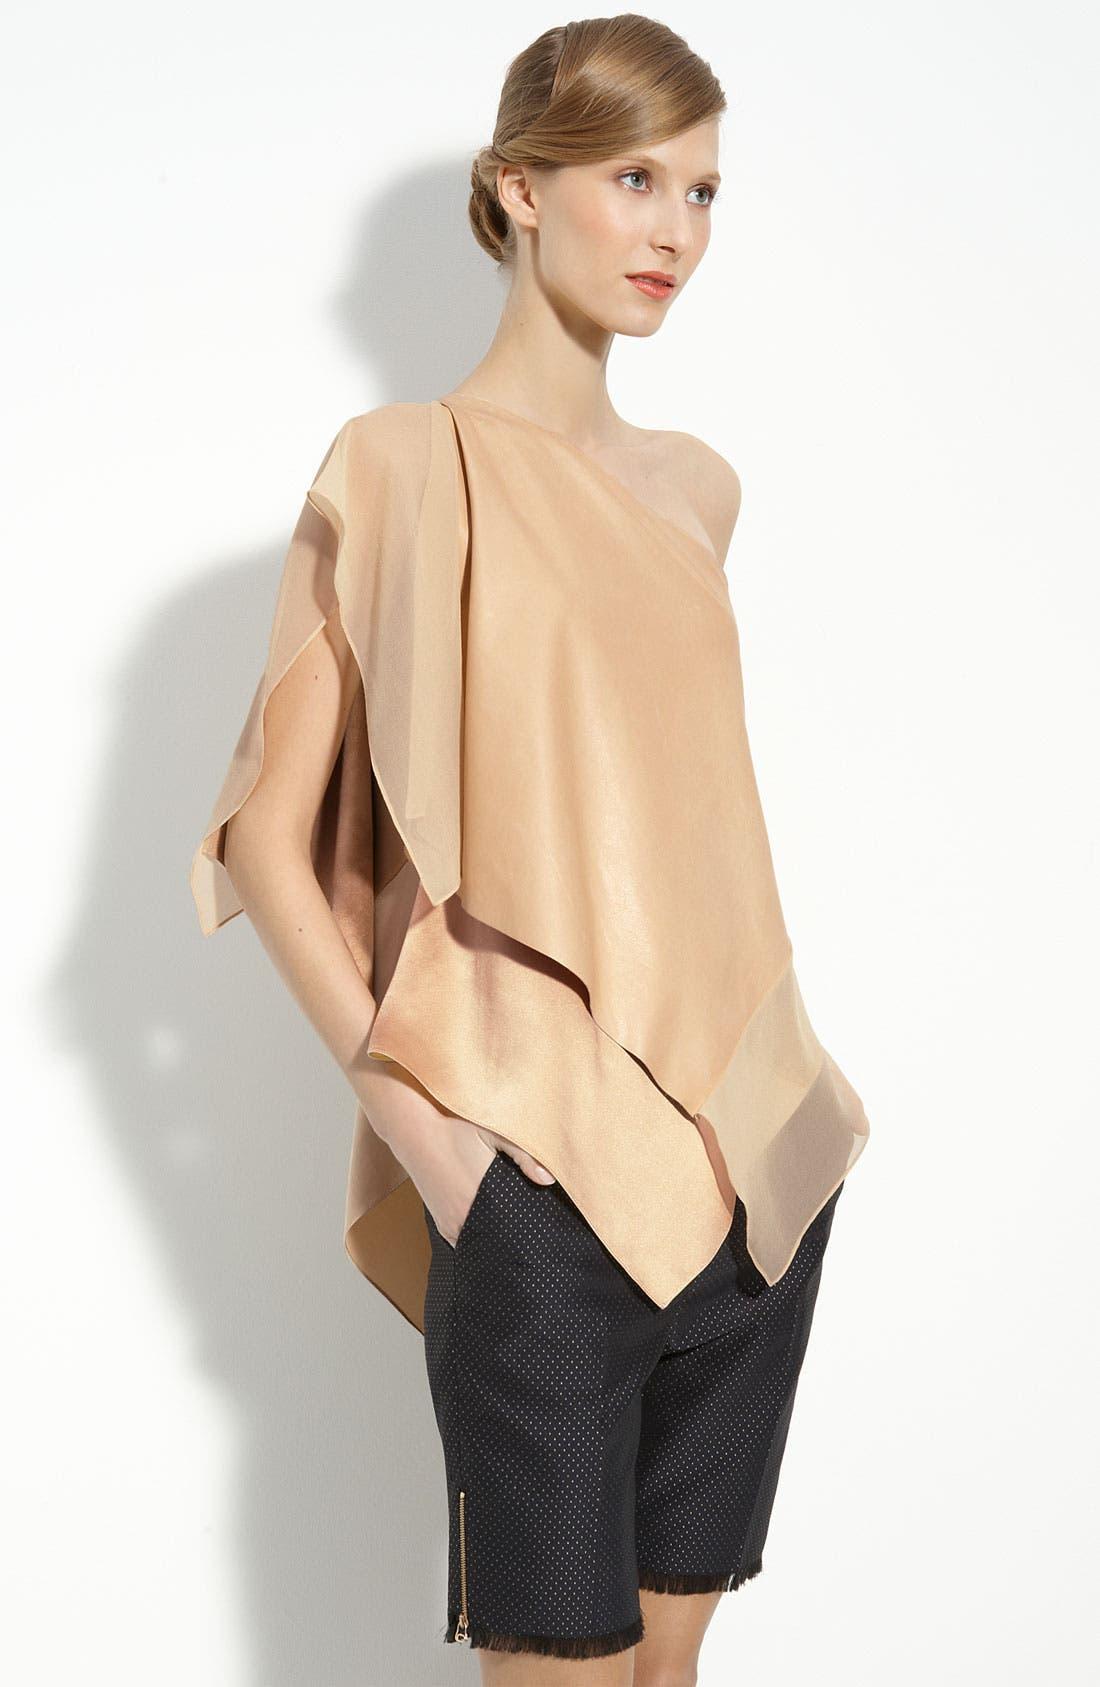 Alternate Image 1 Selected - 3.1 Phillip Lim Silk & Leather One Shoulder Top